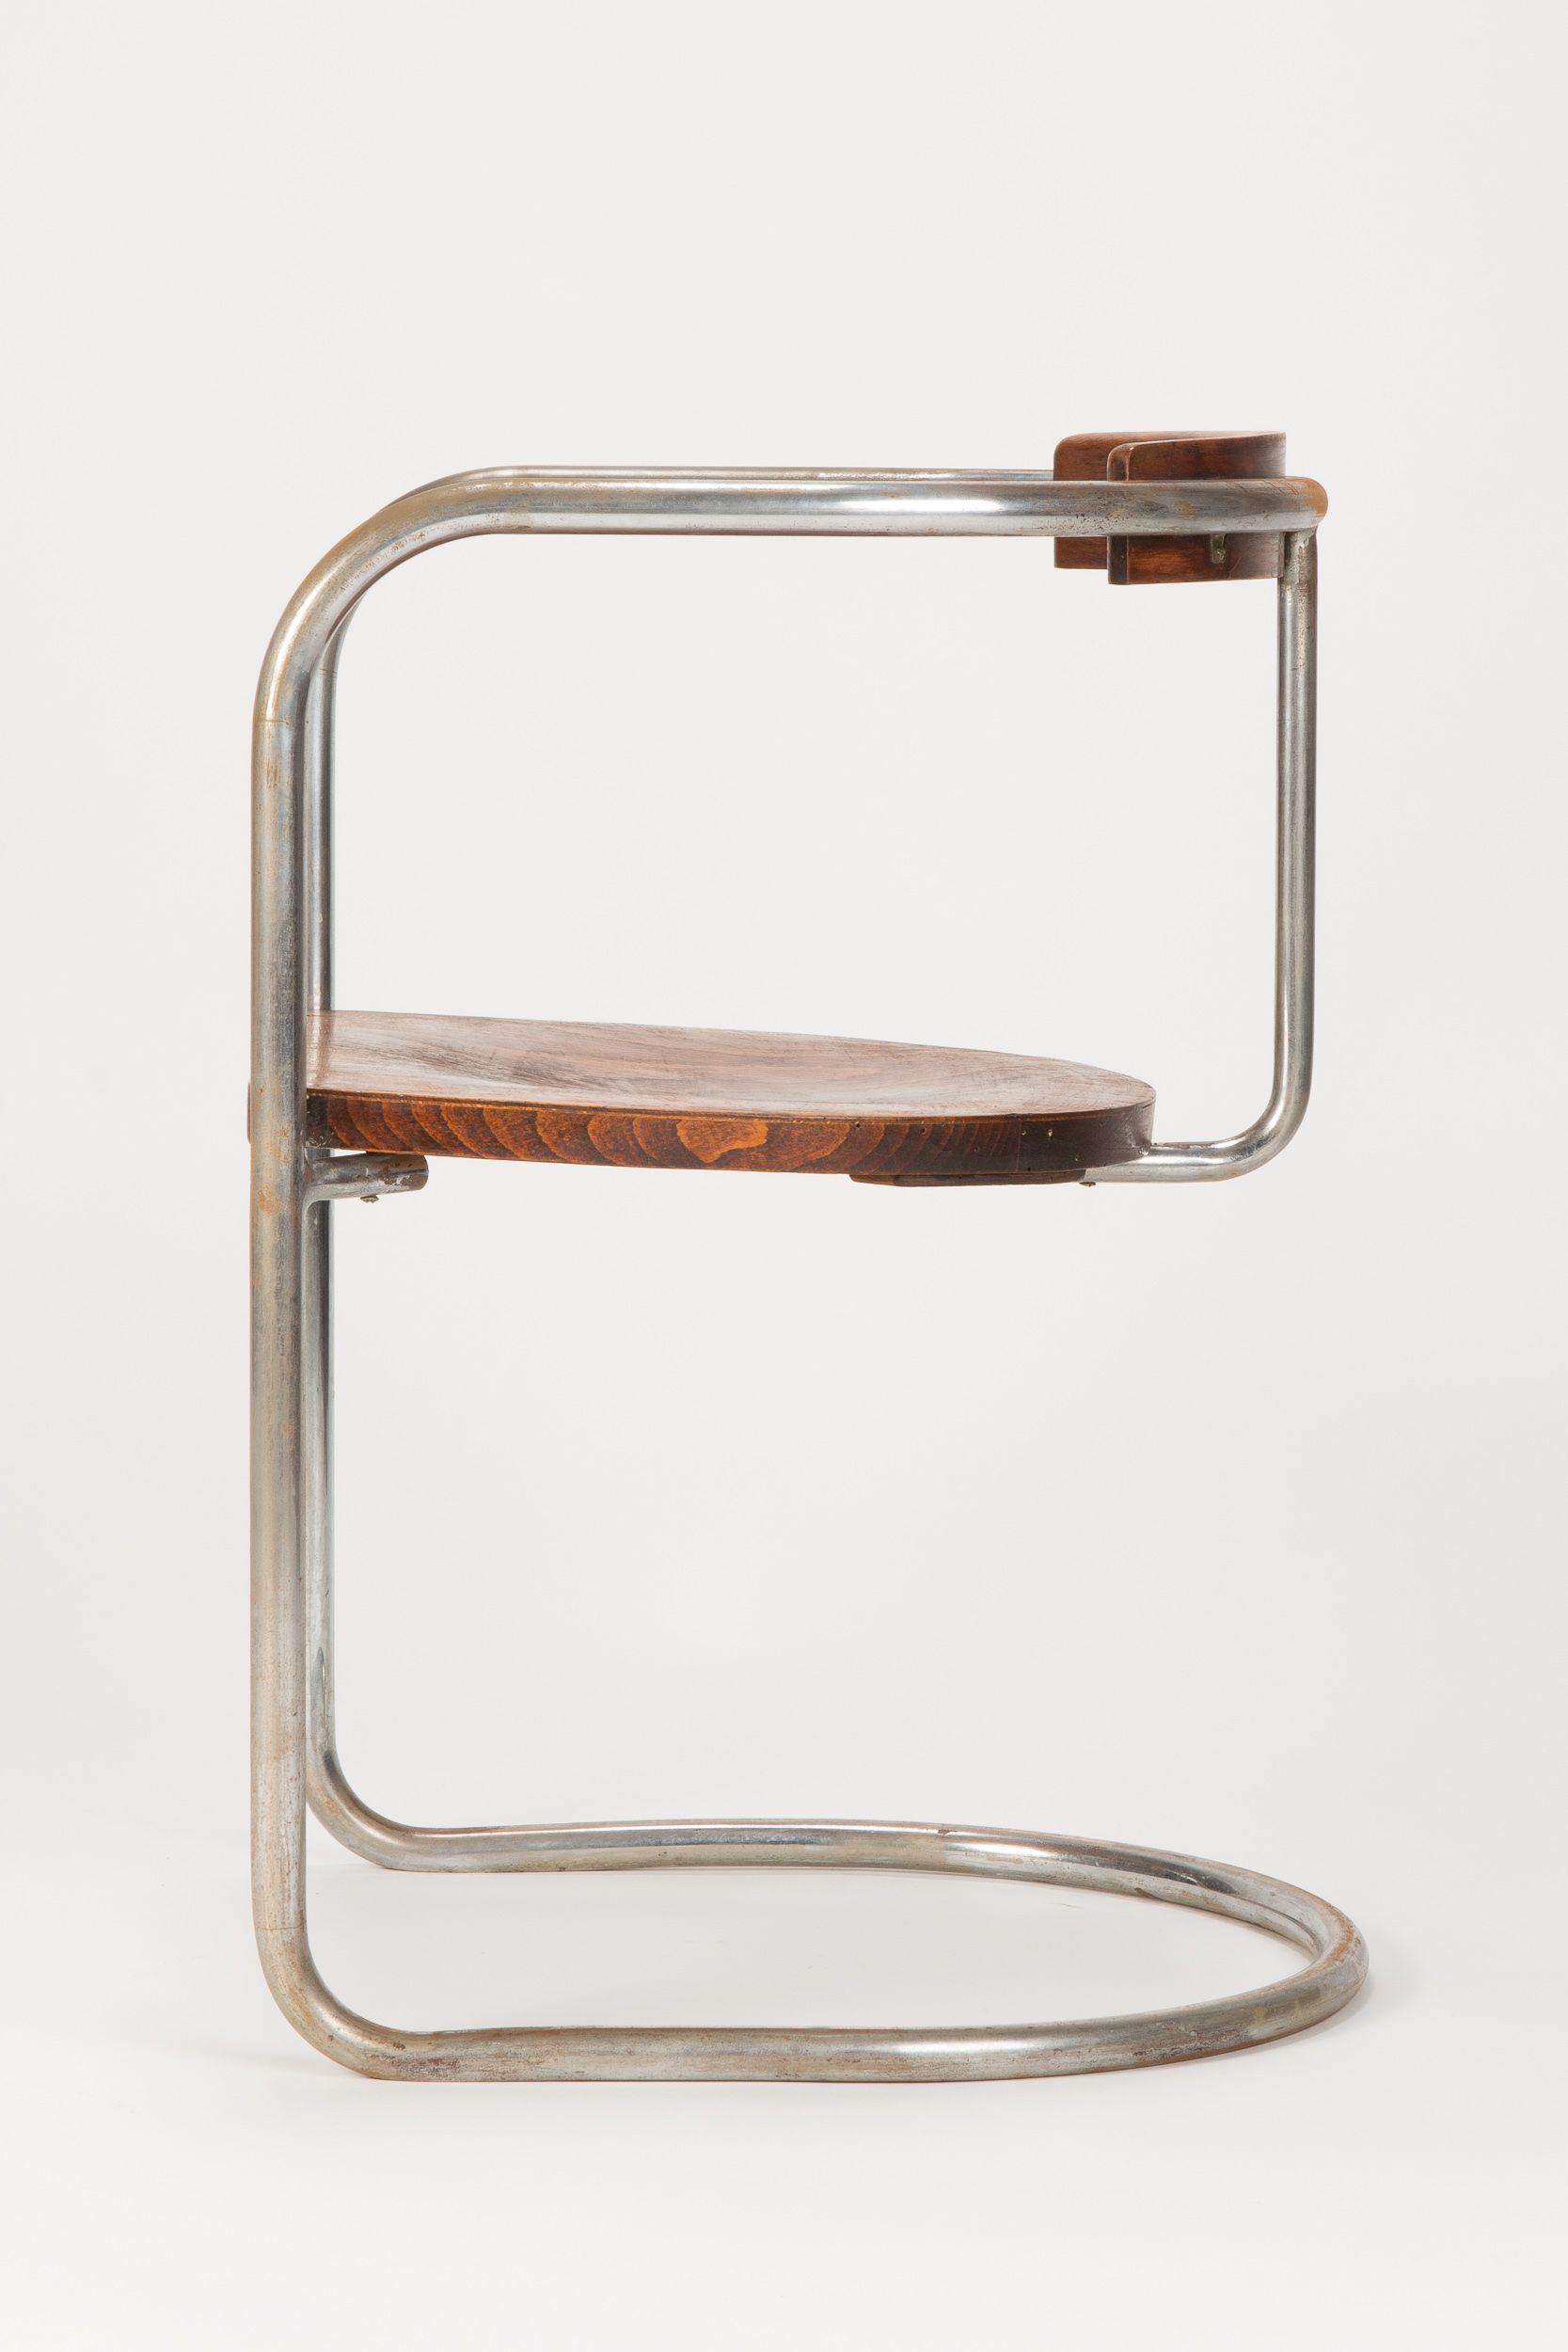 Bauhaus Steel Tube Cantilever Chair 30s Bauhaus In 2018